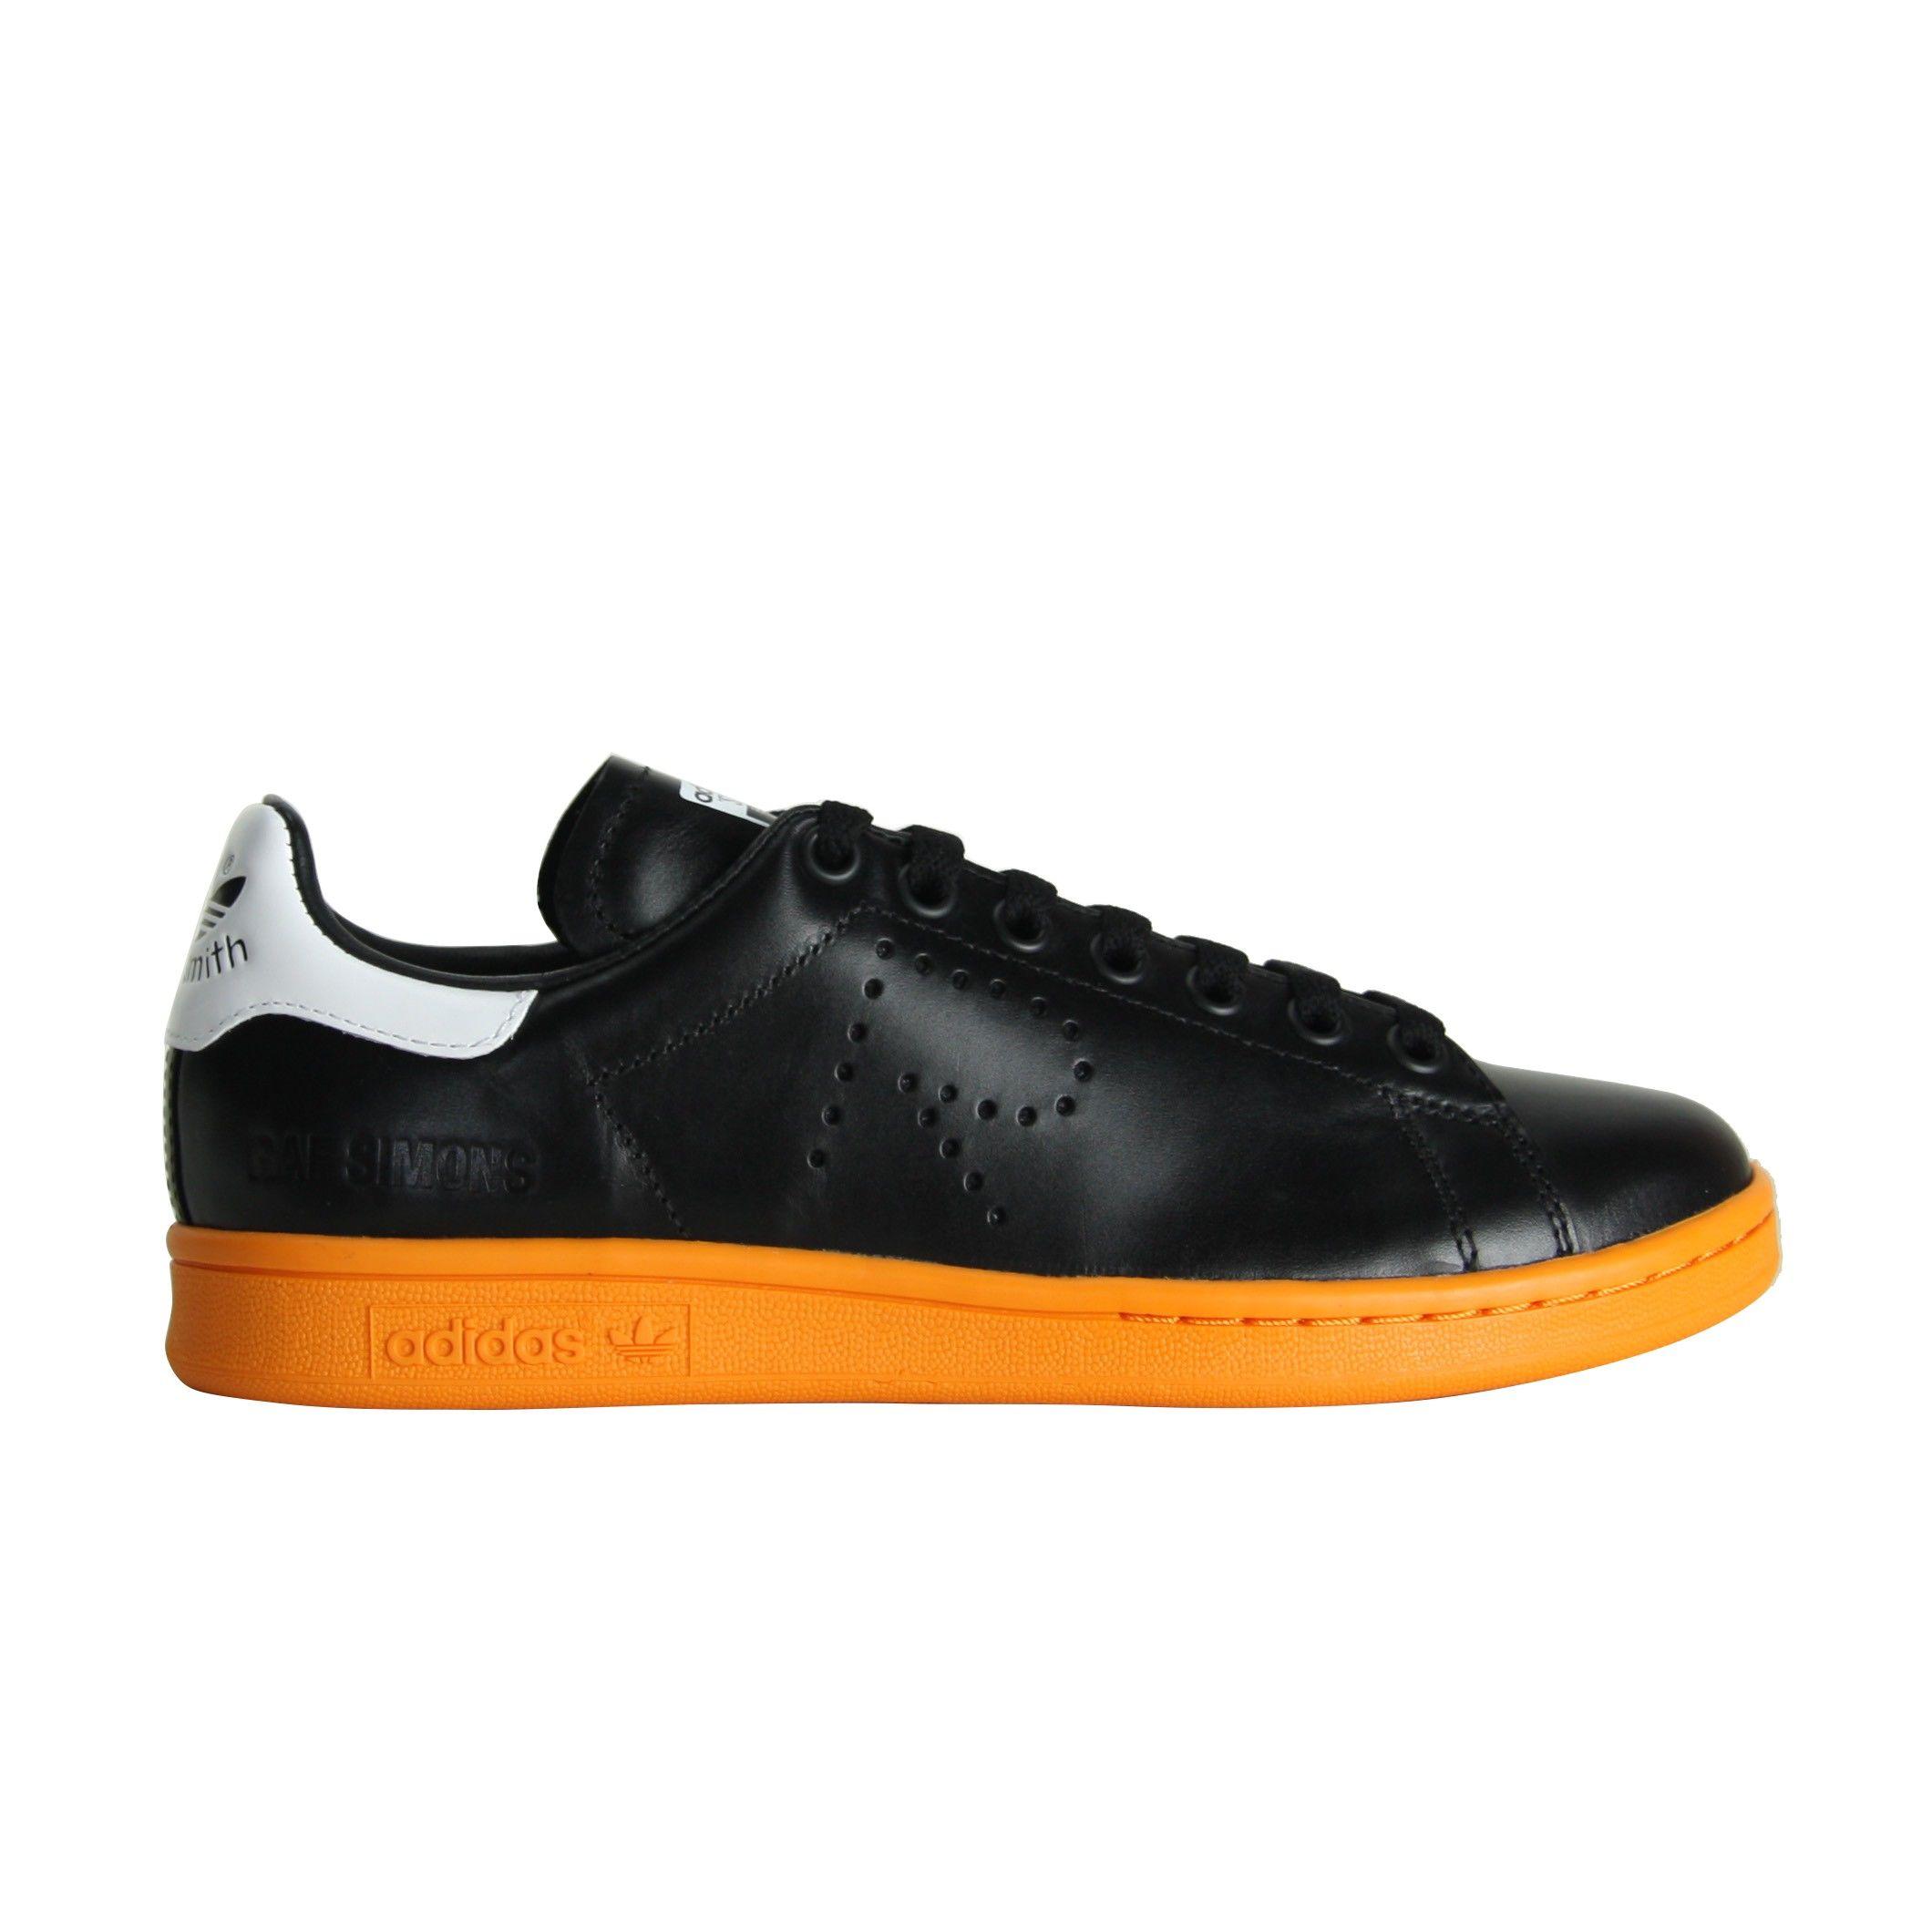 Adidas By Raf Simons Black Sneakers